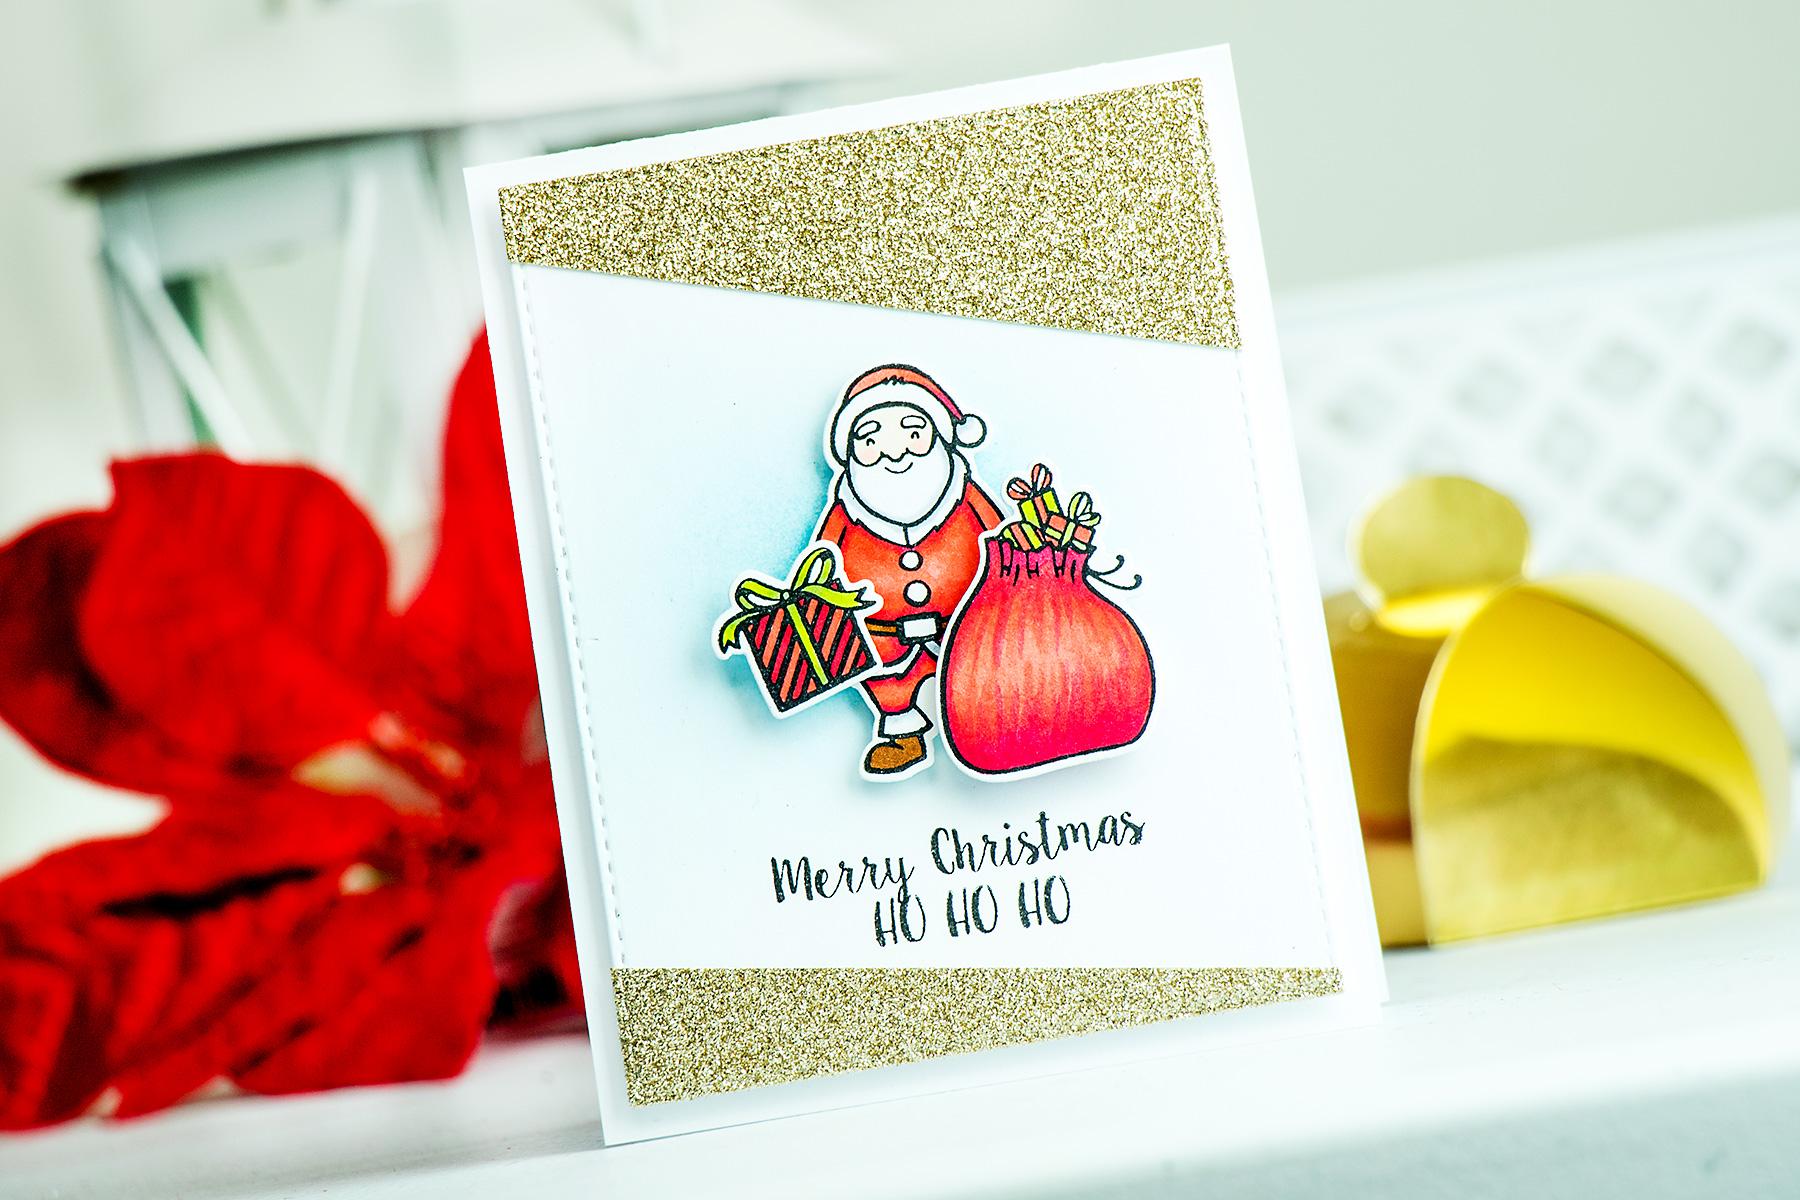 Yana Smakula | Neat & Tangled Release Week. Day 1 - Santa's Ride